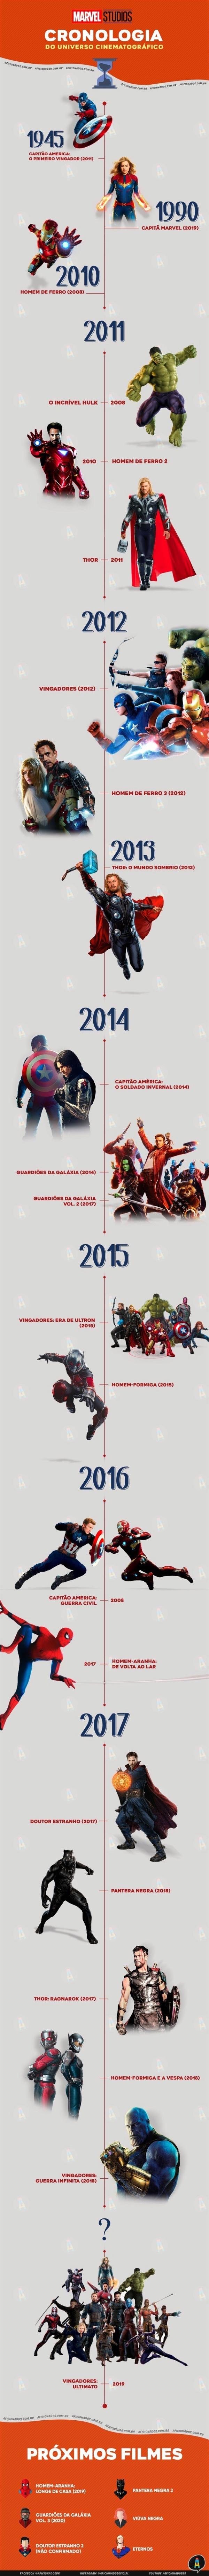 cronologia infografico filmes da marvel